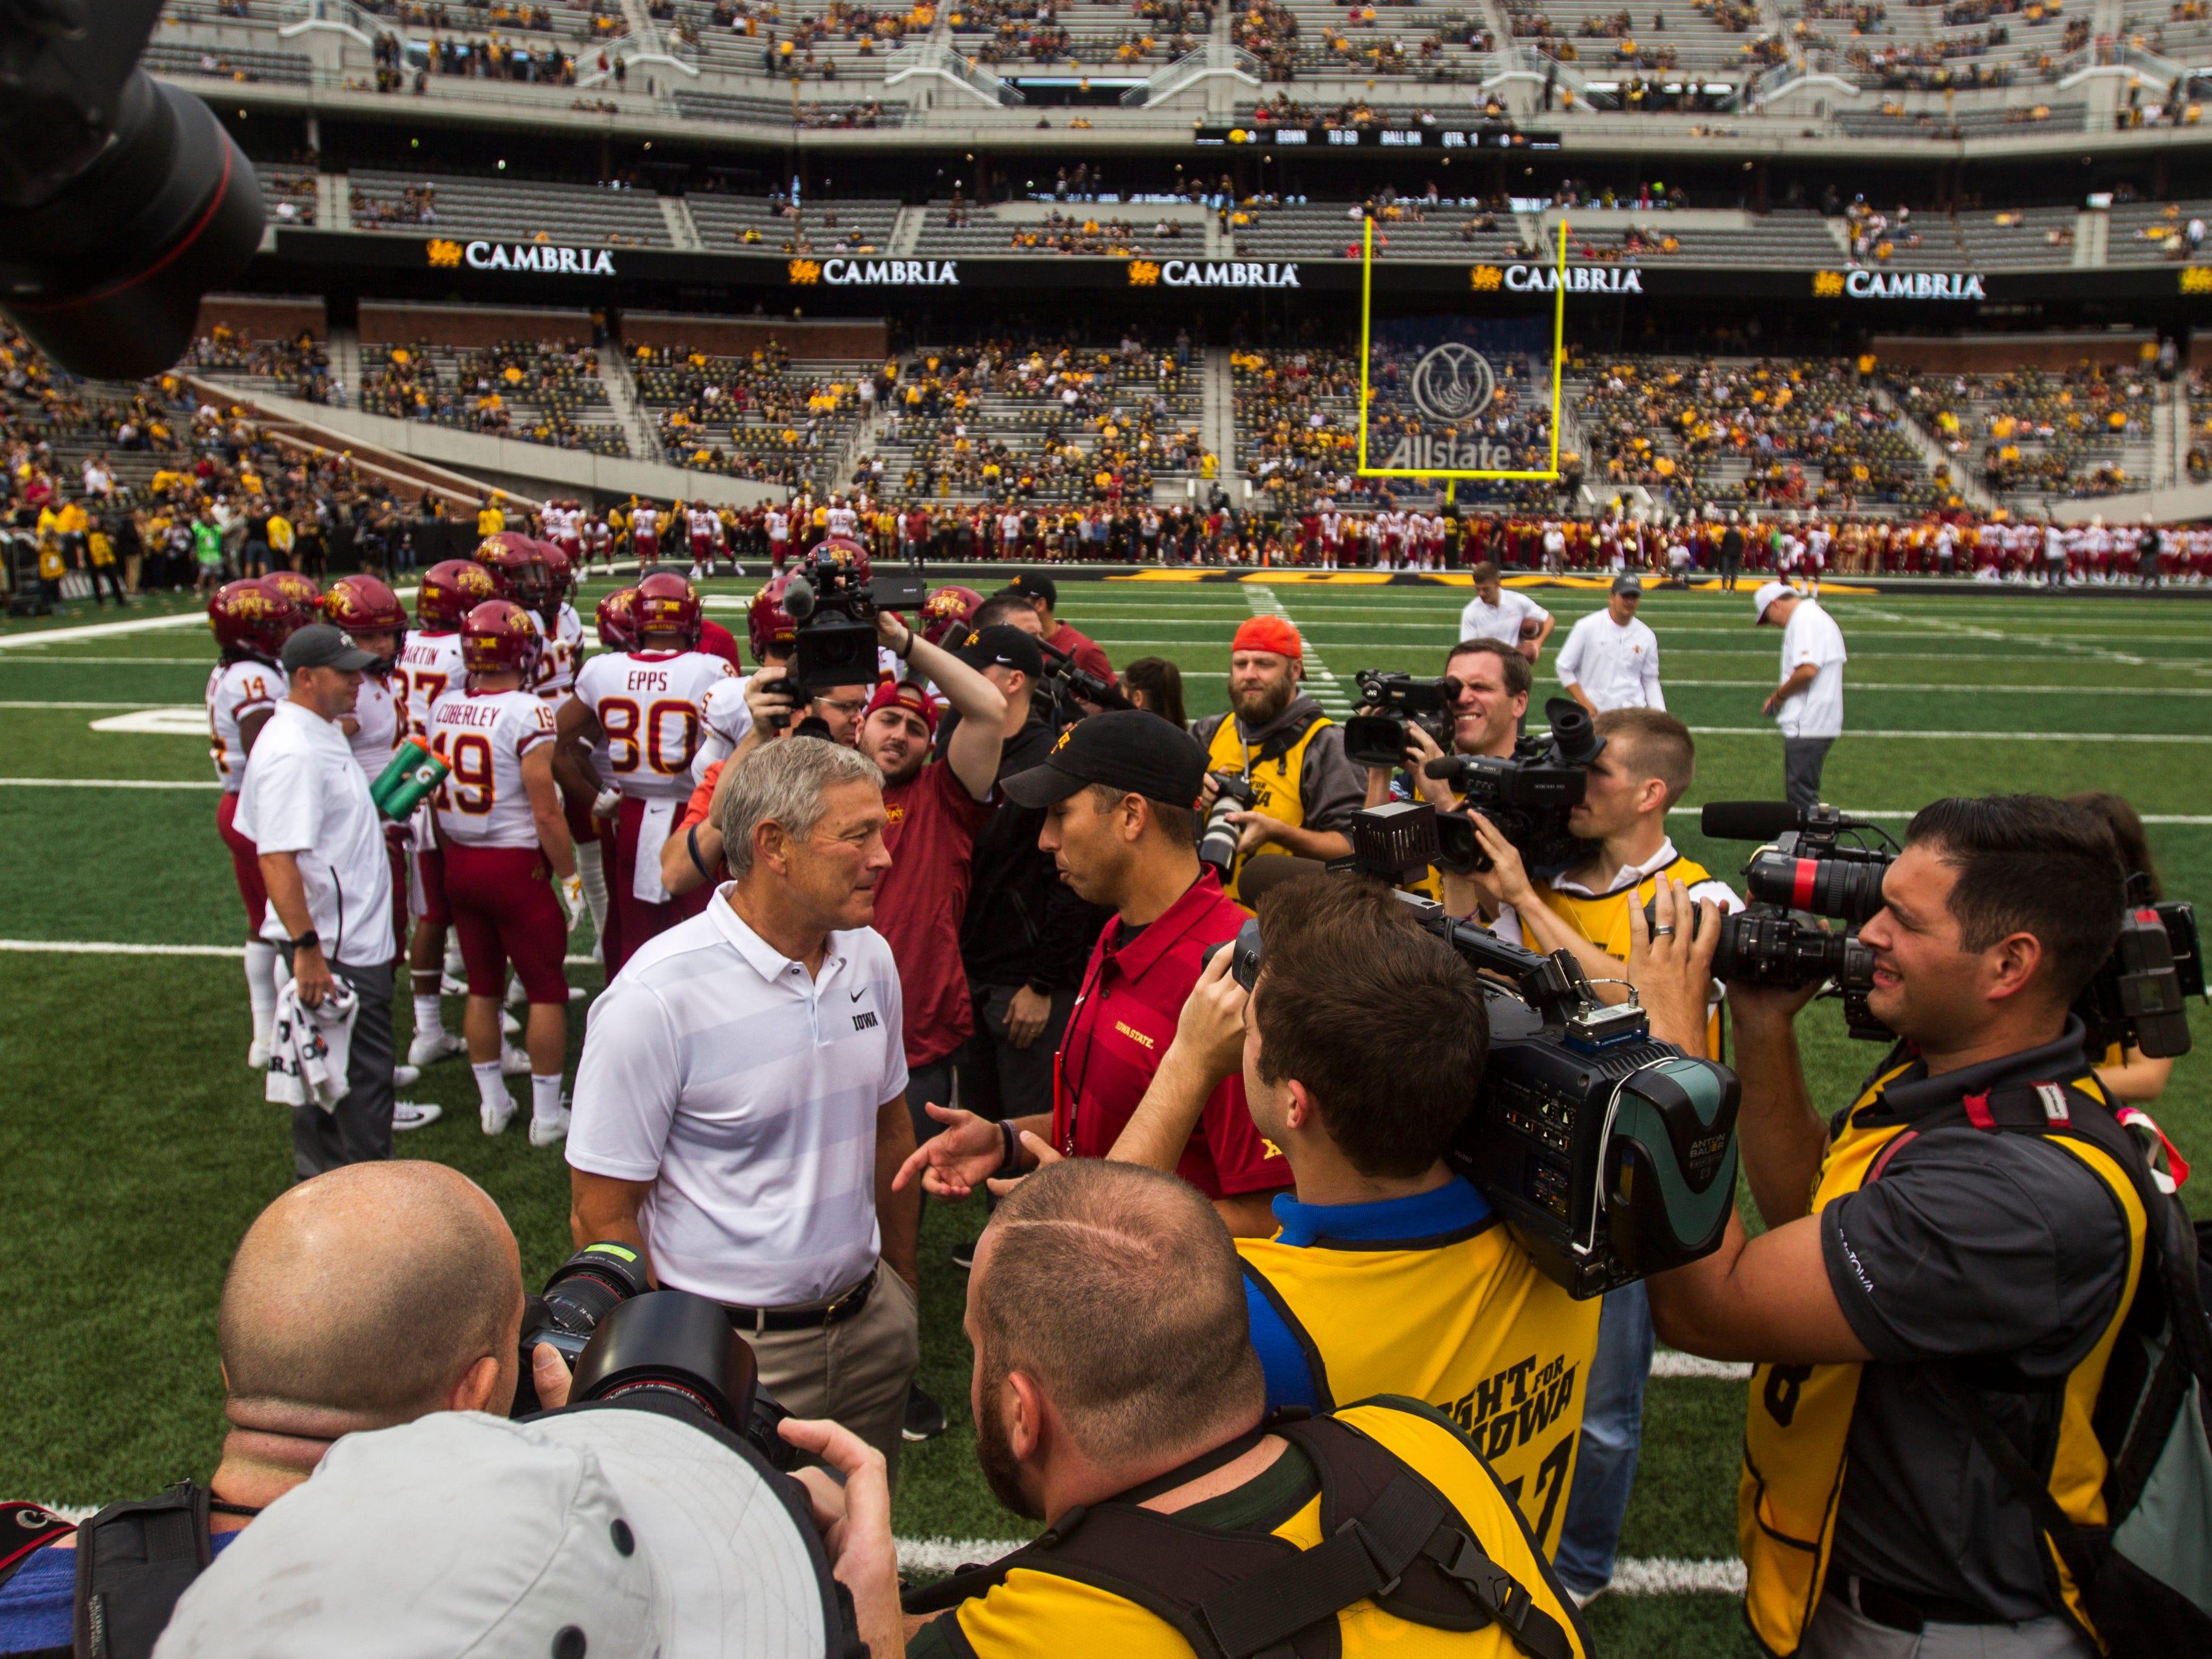 Iowa head coach Kirk Ferentz and Iowa State head coach Matt Campbell meet a midfield before the Cy-Hawk NCAA football game on Saturday, Sept. 8, 2018, at Kinnick Stadium in Iowa City.